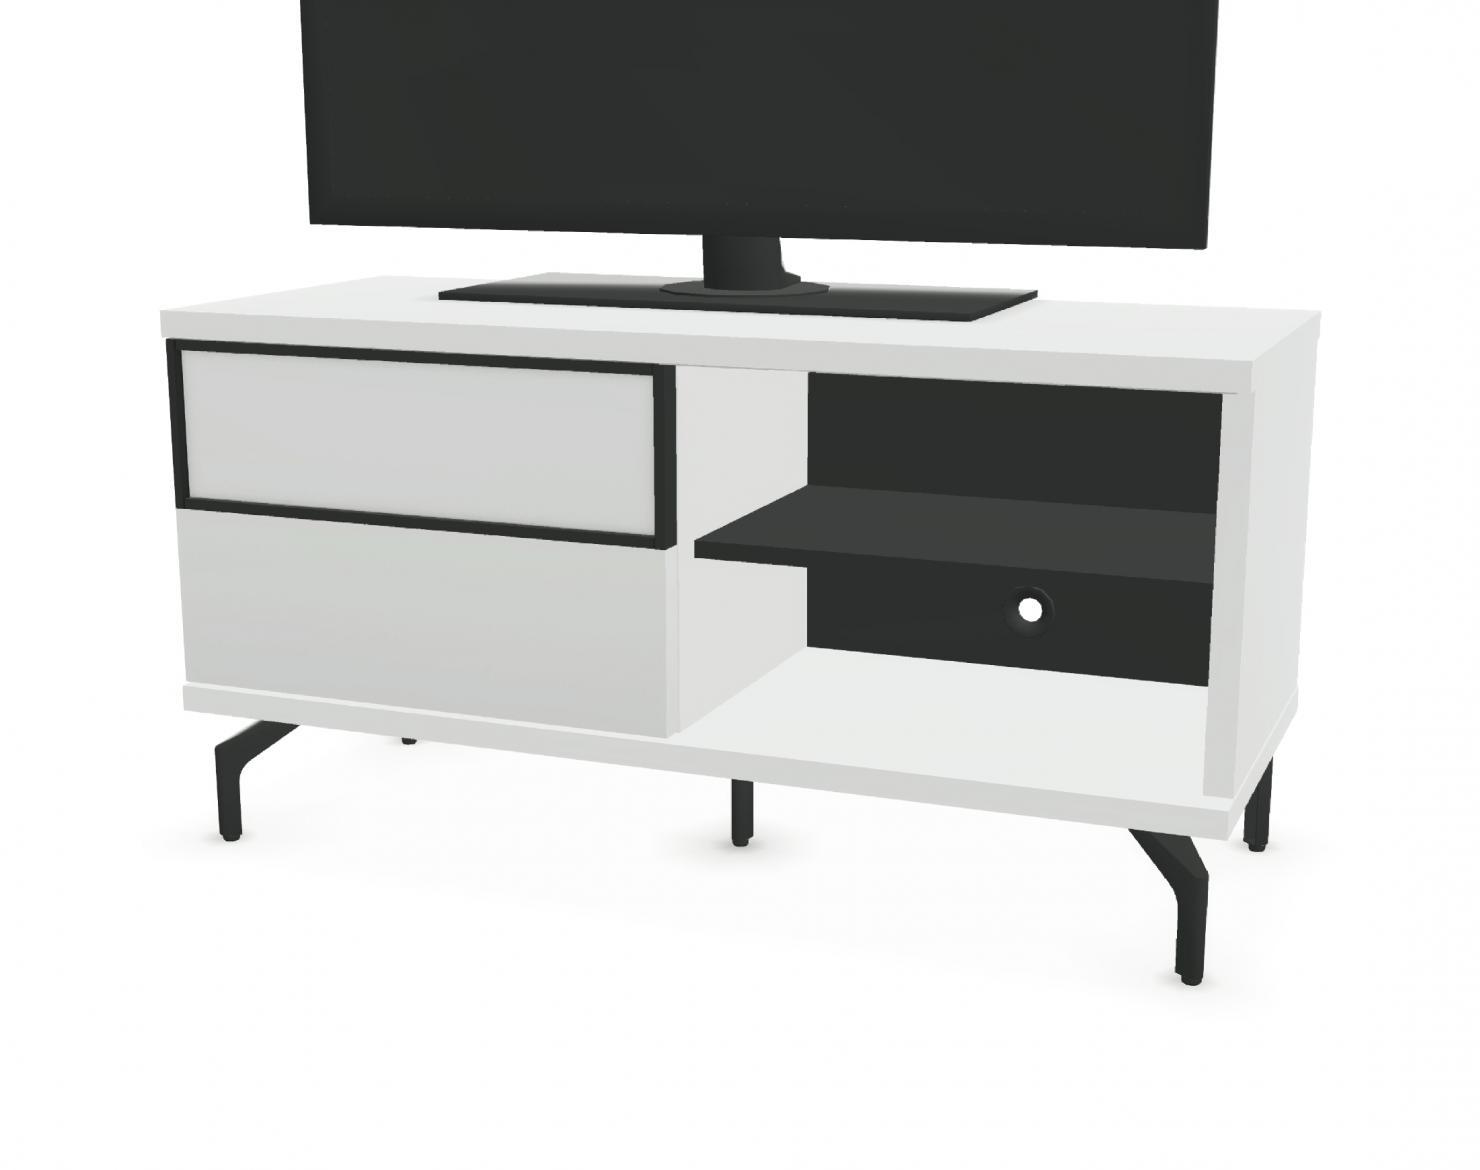 meuble tv 1 porte coulissante 2 niches fa ade bois. Black Bedroom Furniture Sets. Home Design Ideas